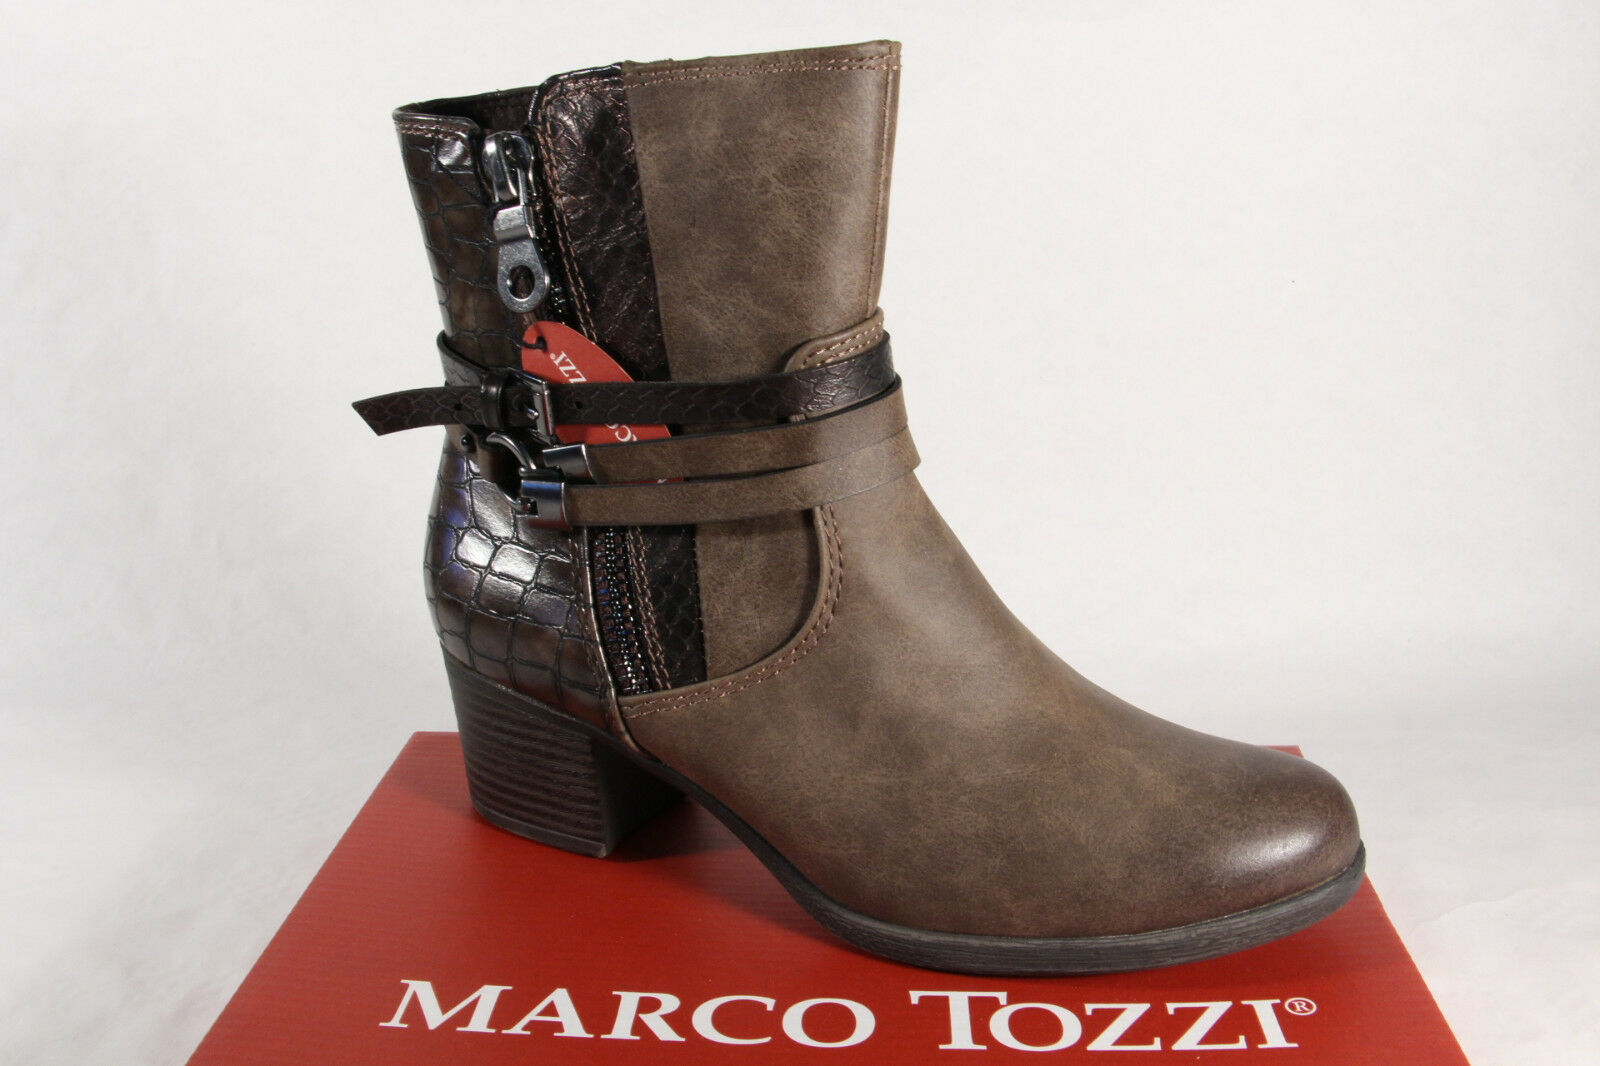 Marco Tozzi señora botas botín nuevo botas marrón nuevo botín 7d828e